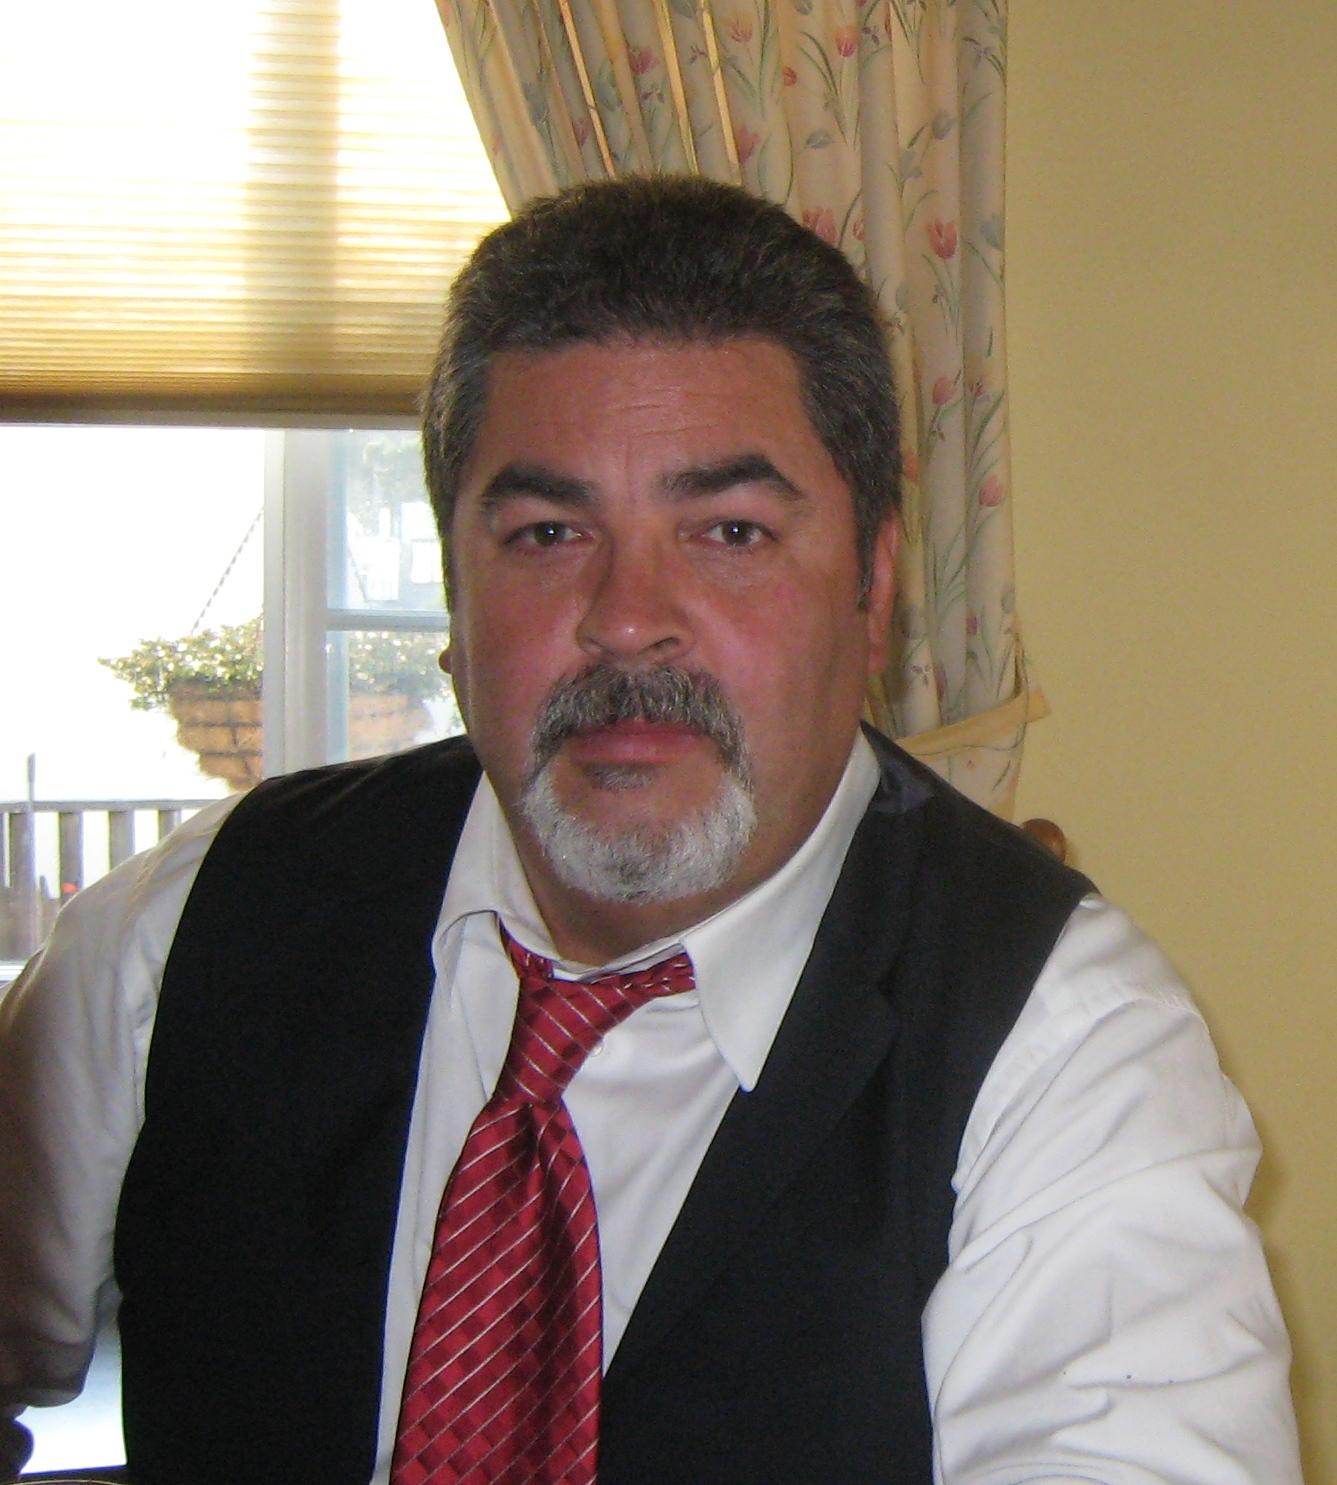 John D. Forsyth - Criminal Defense Attorney